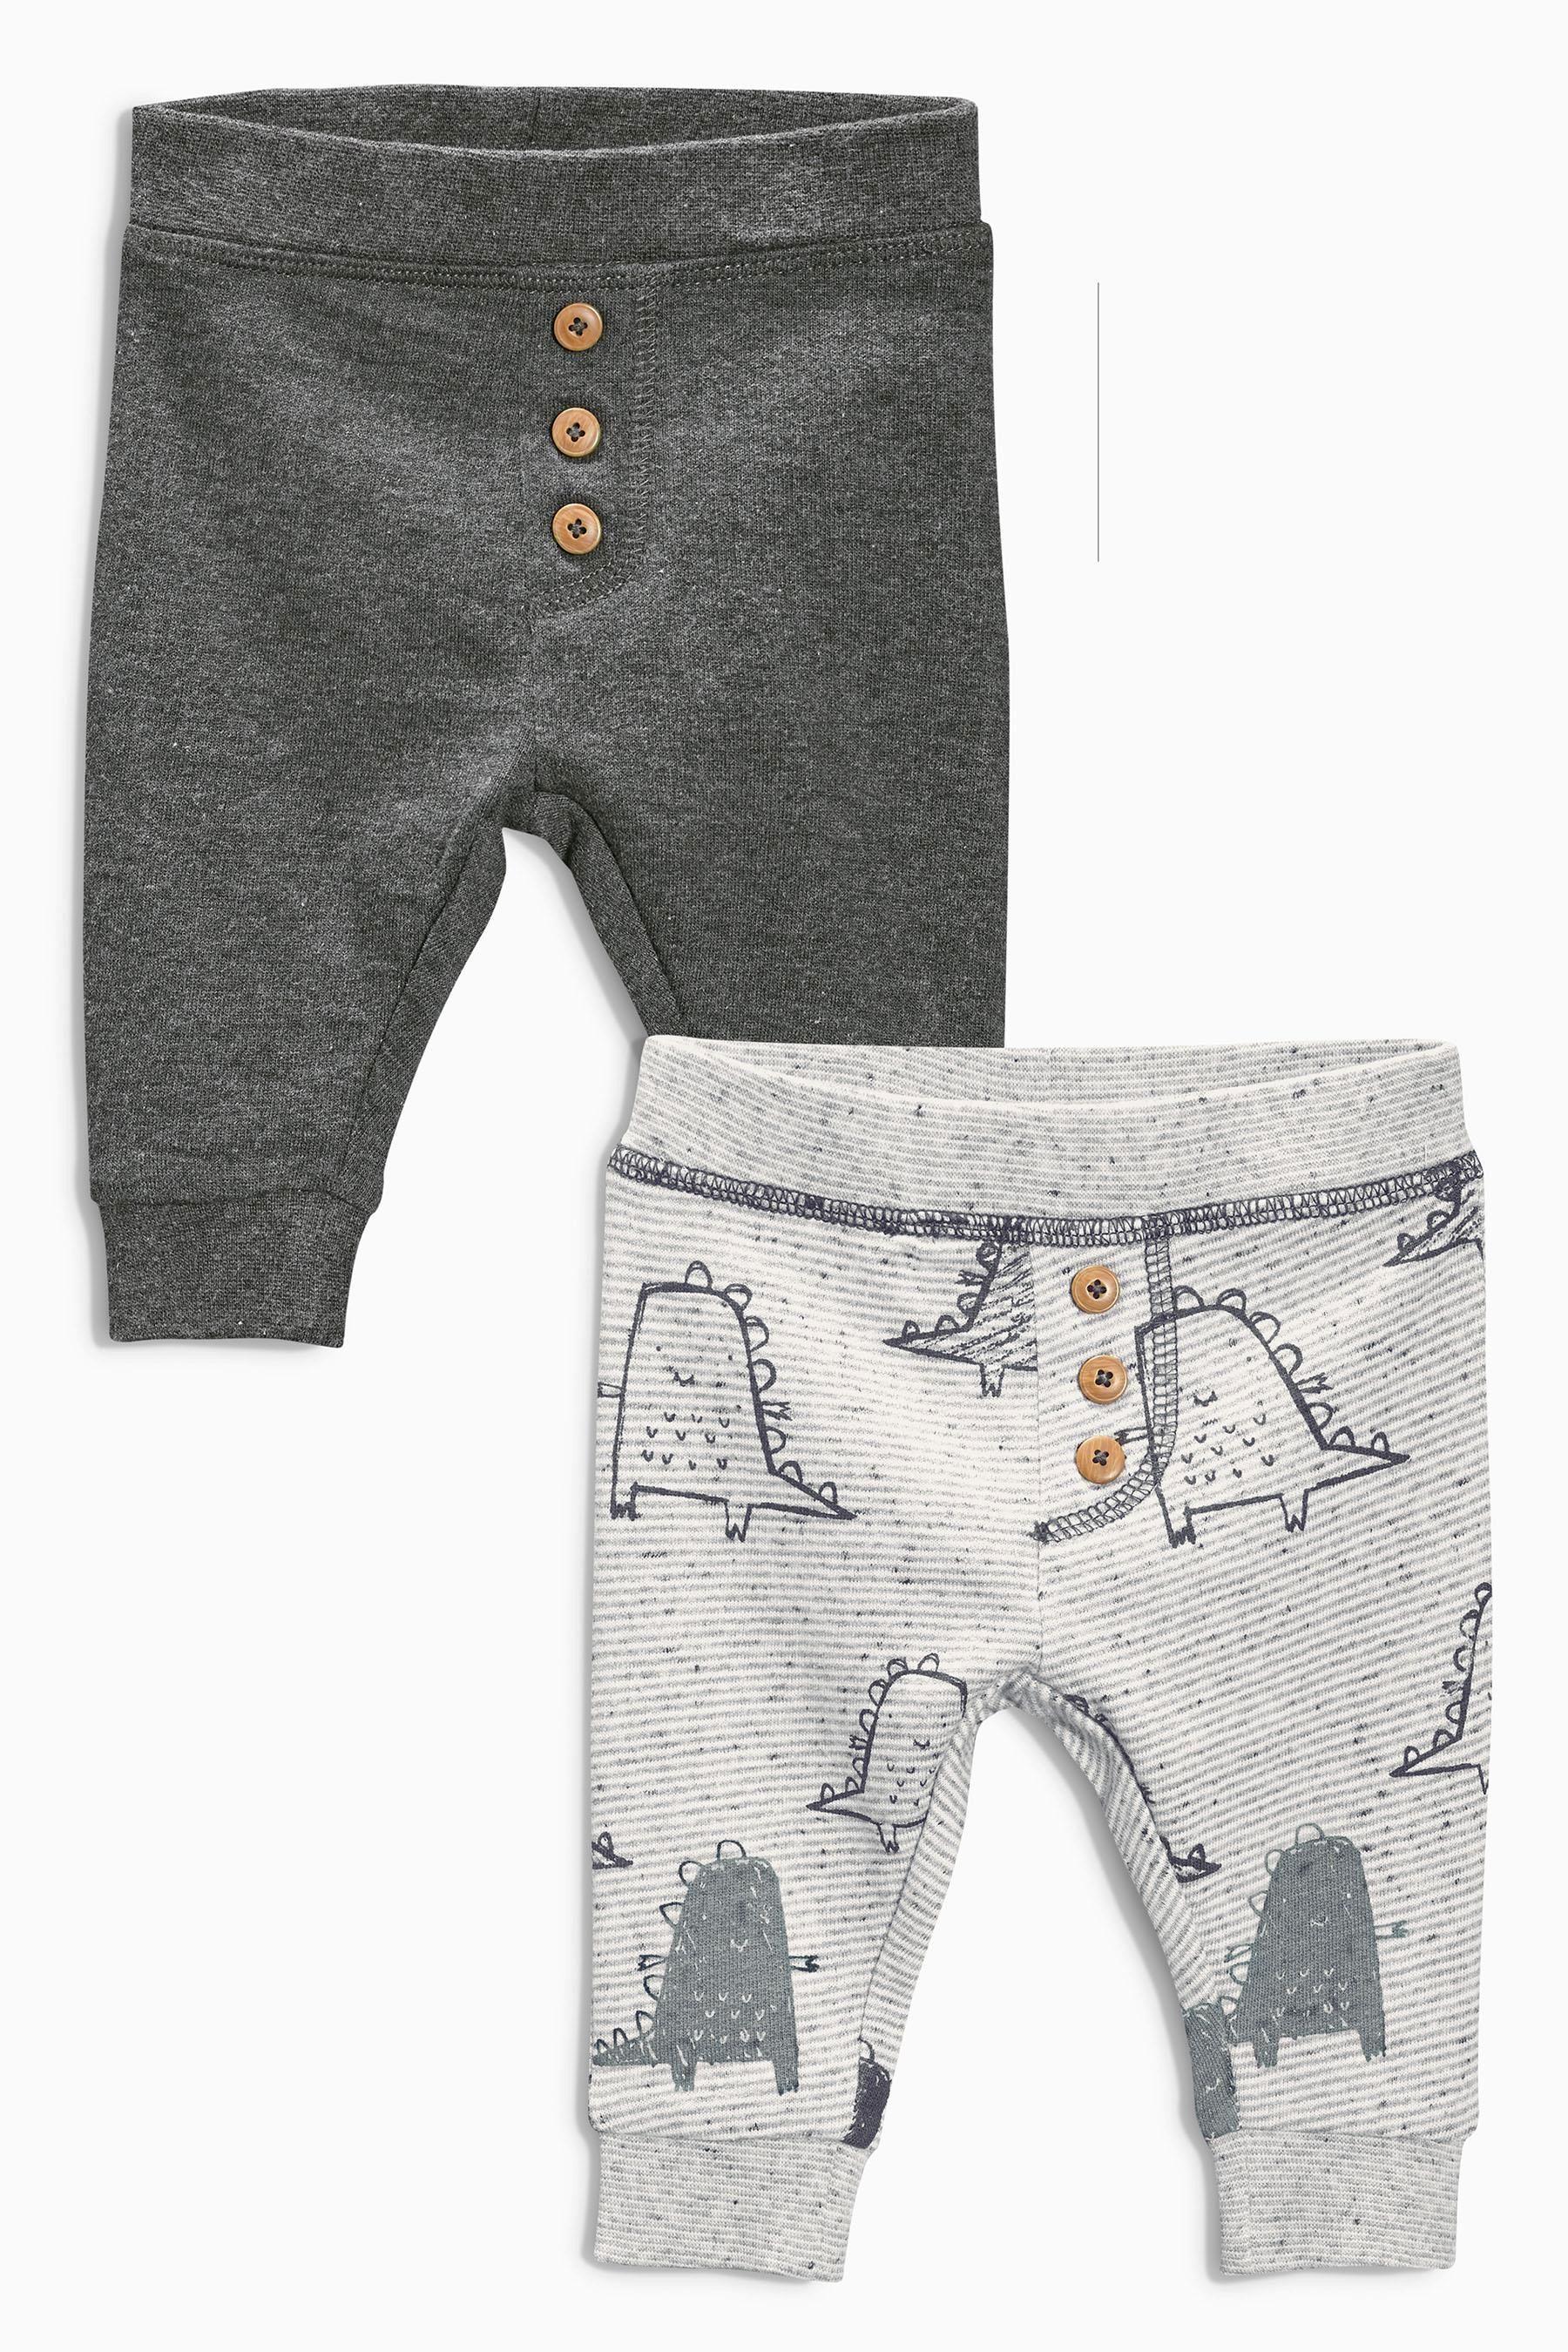 Pin by Nicole Steward on Kid Clothing Pinterest